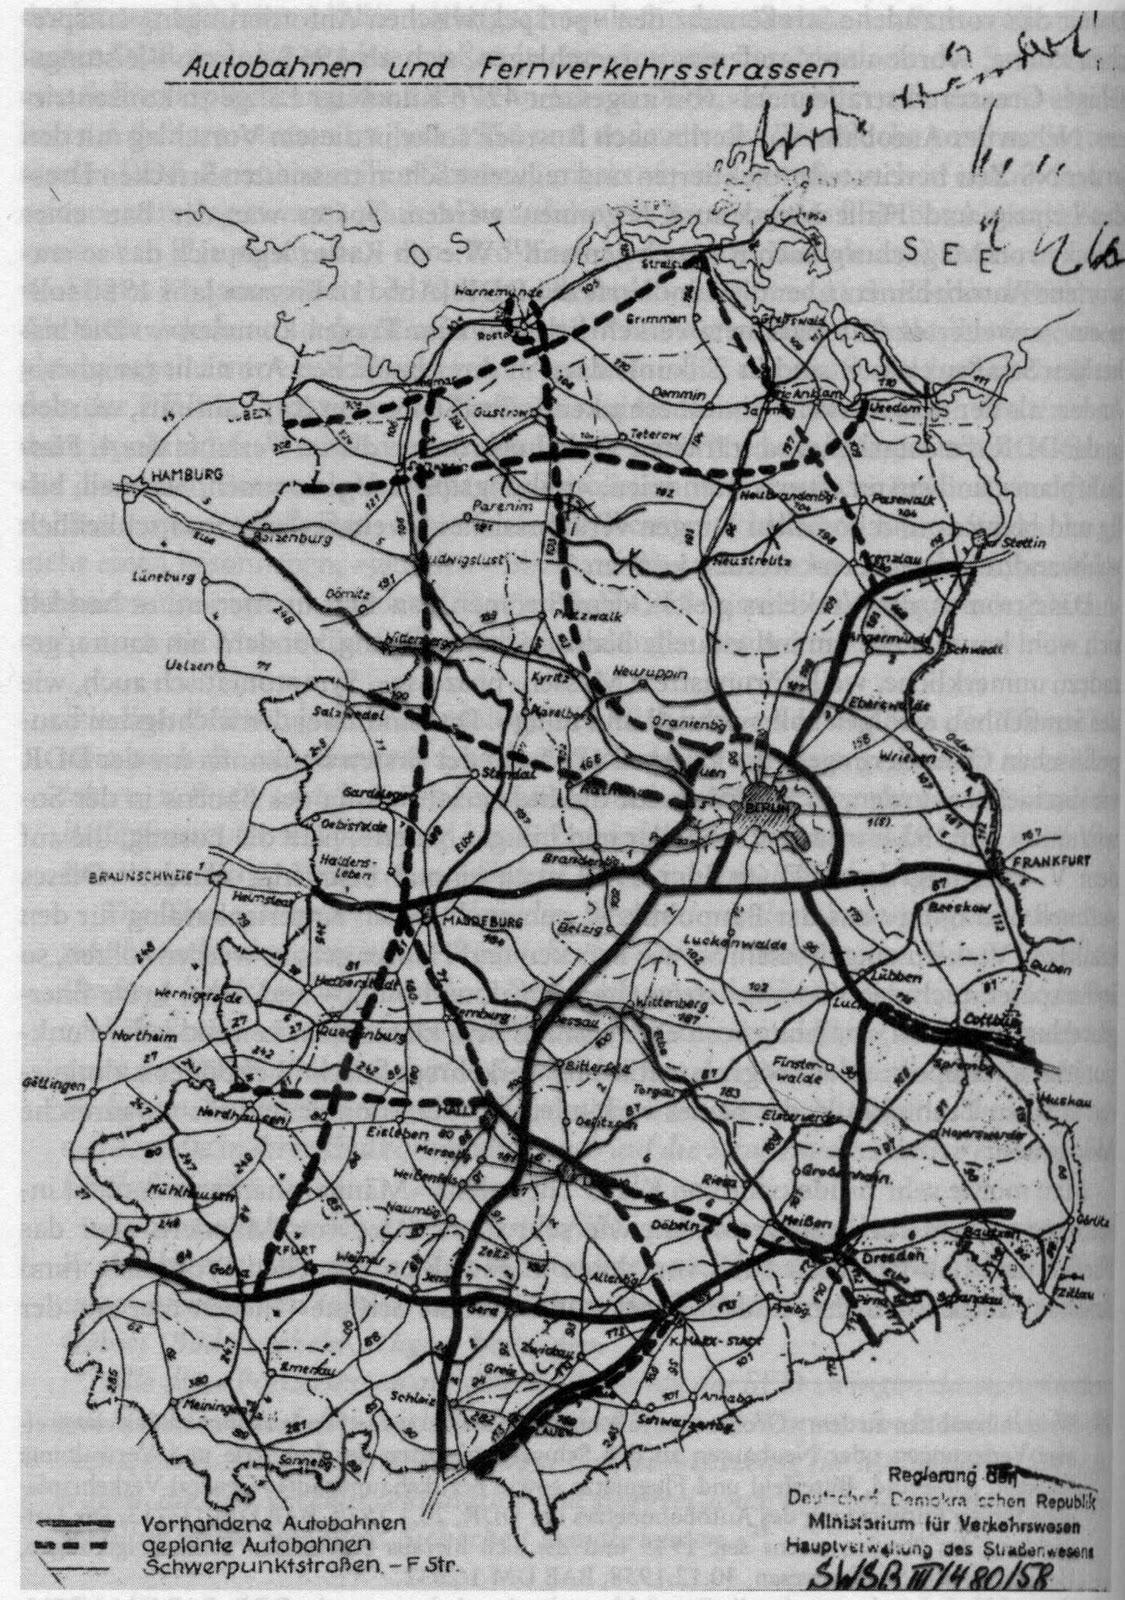 Technik Autobahnkarten Historische Landkarten